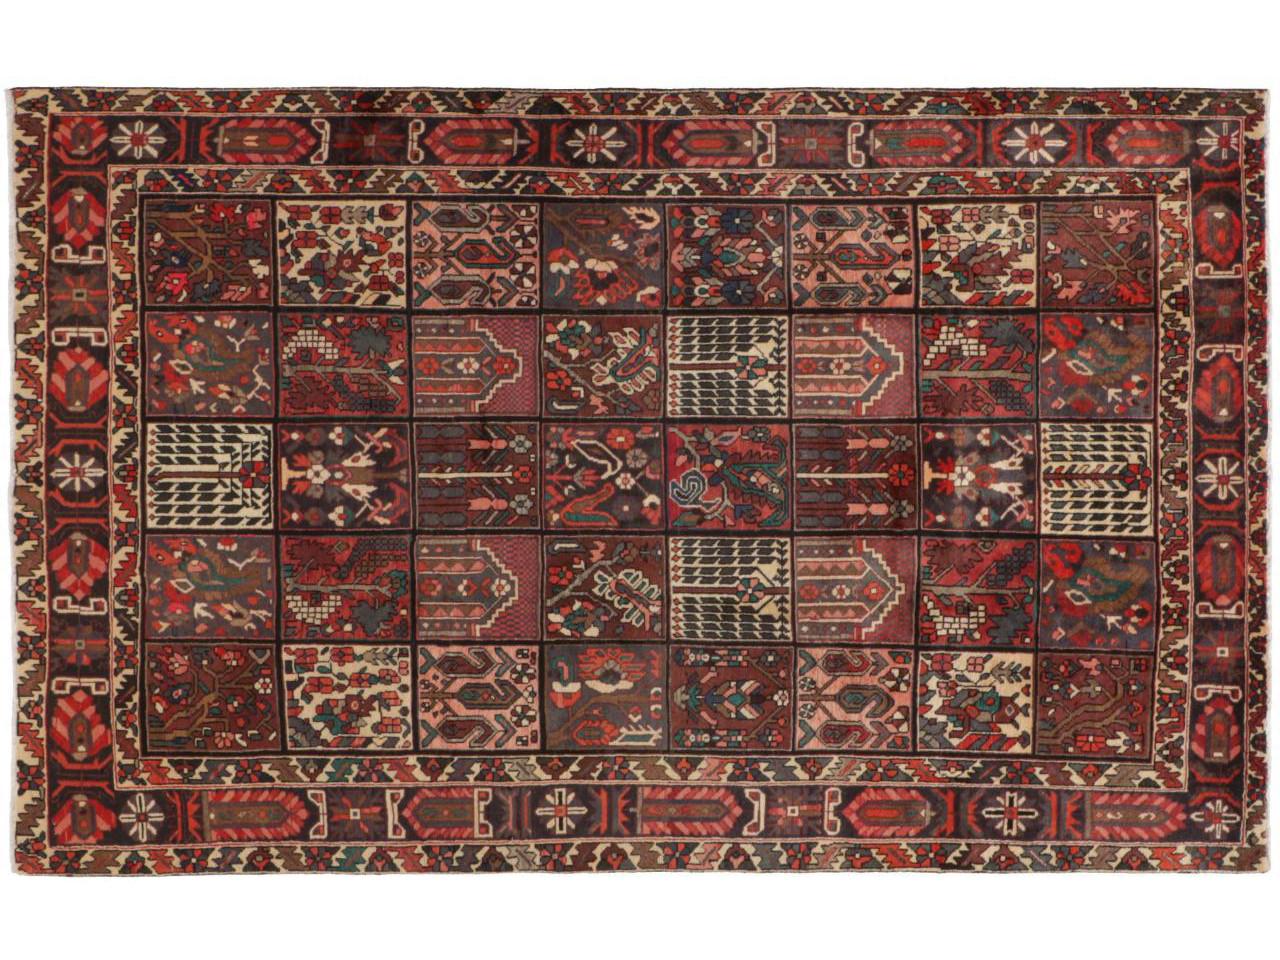 bakhtiar tapis persans n 37474 315x210cm. Black Bedroom Furniture Sets. Home Design Ideas